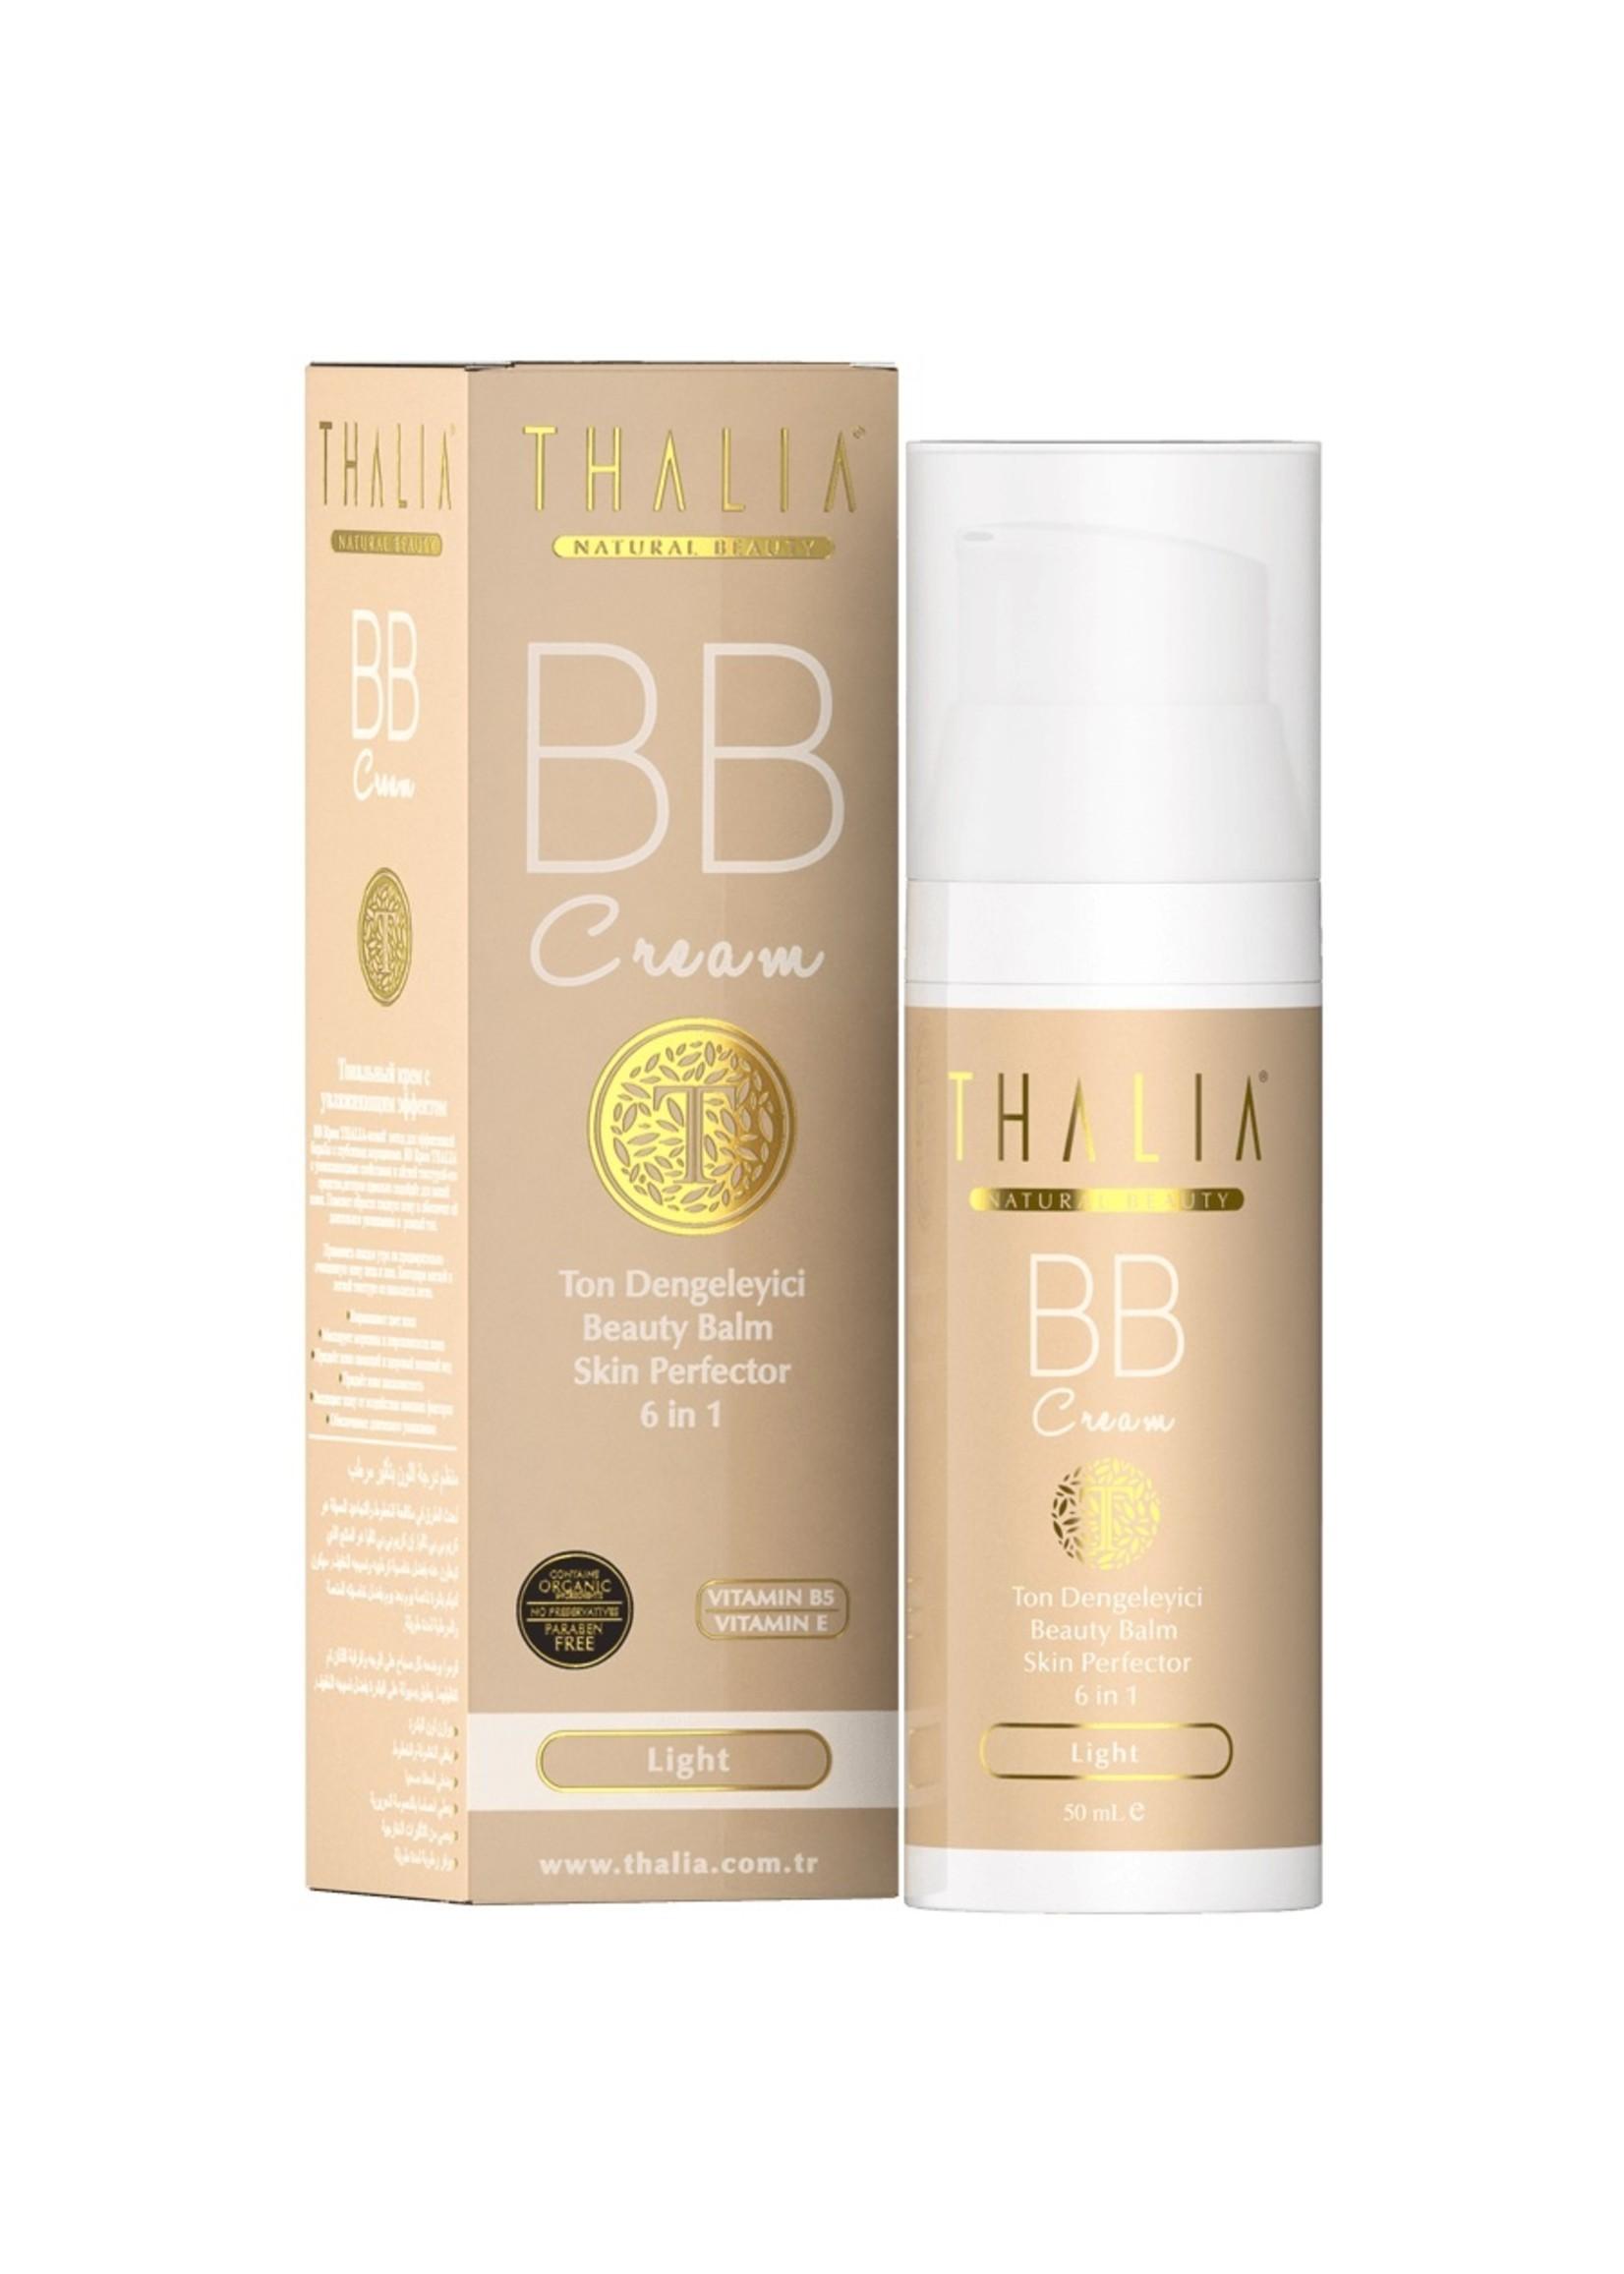 Thalia BB Cream Skin Perfector 6-in-1 Lichte Huid 50 ml